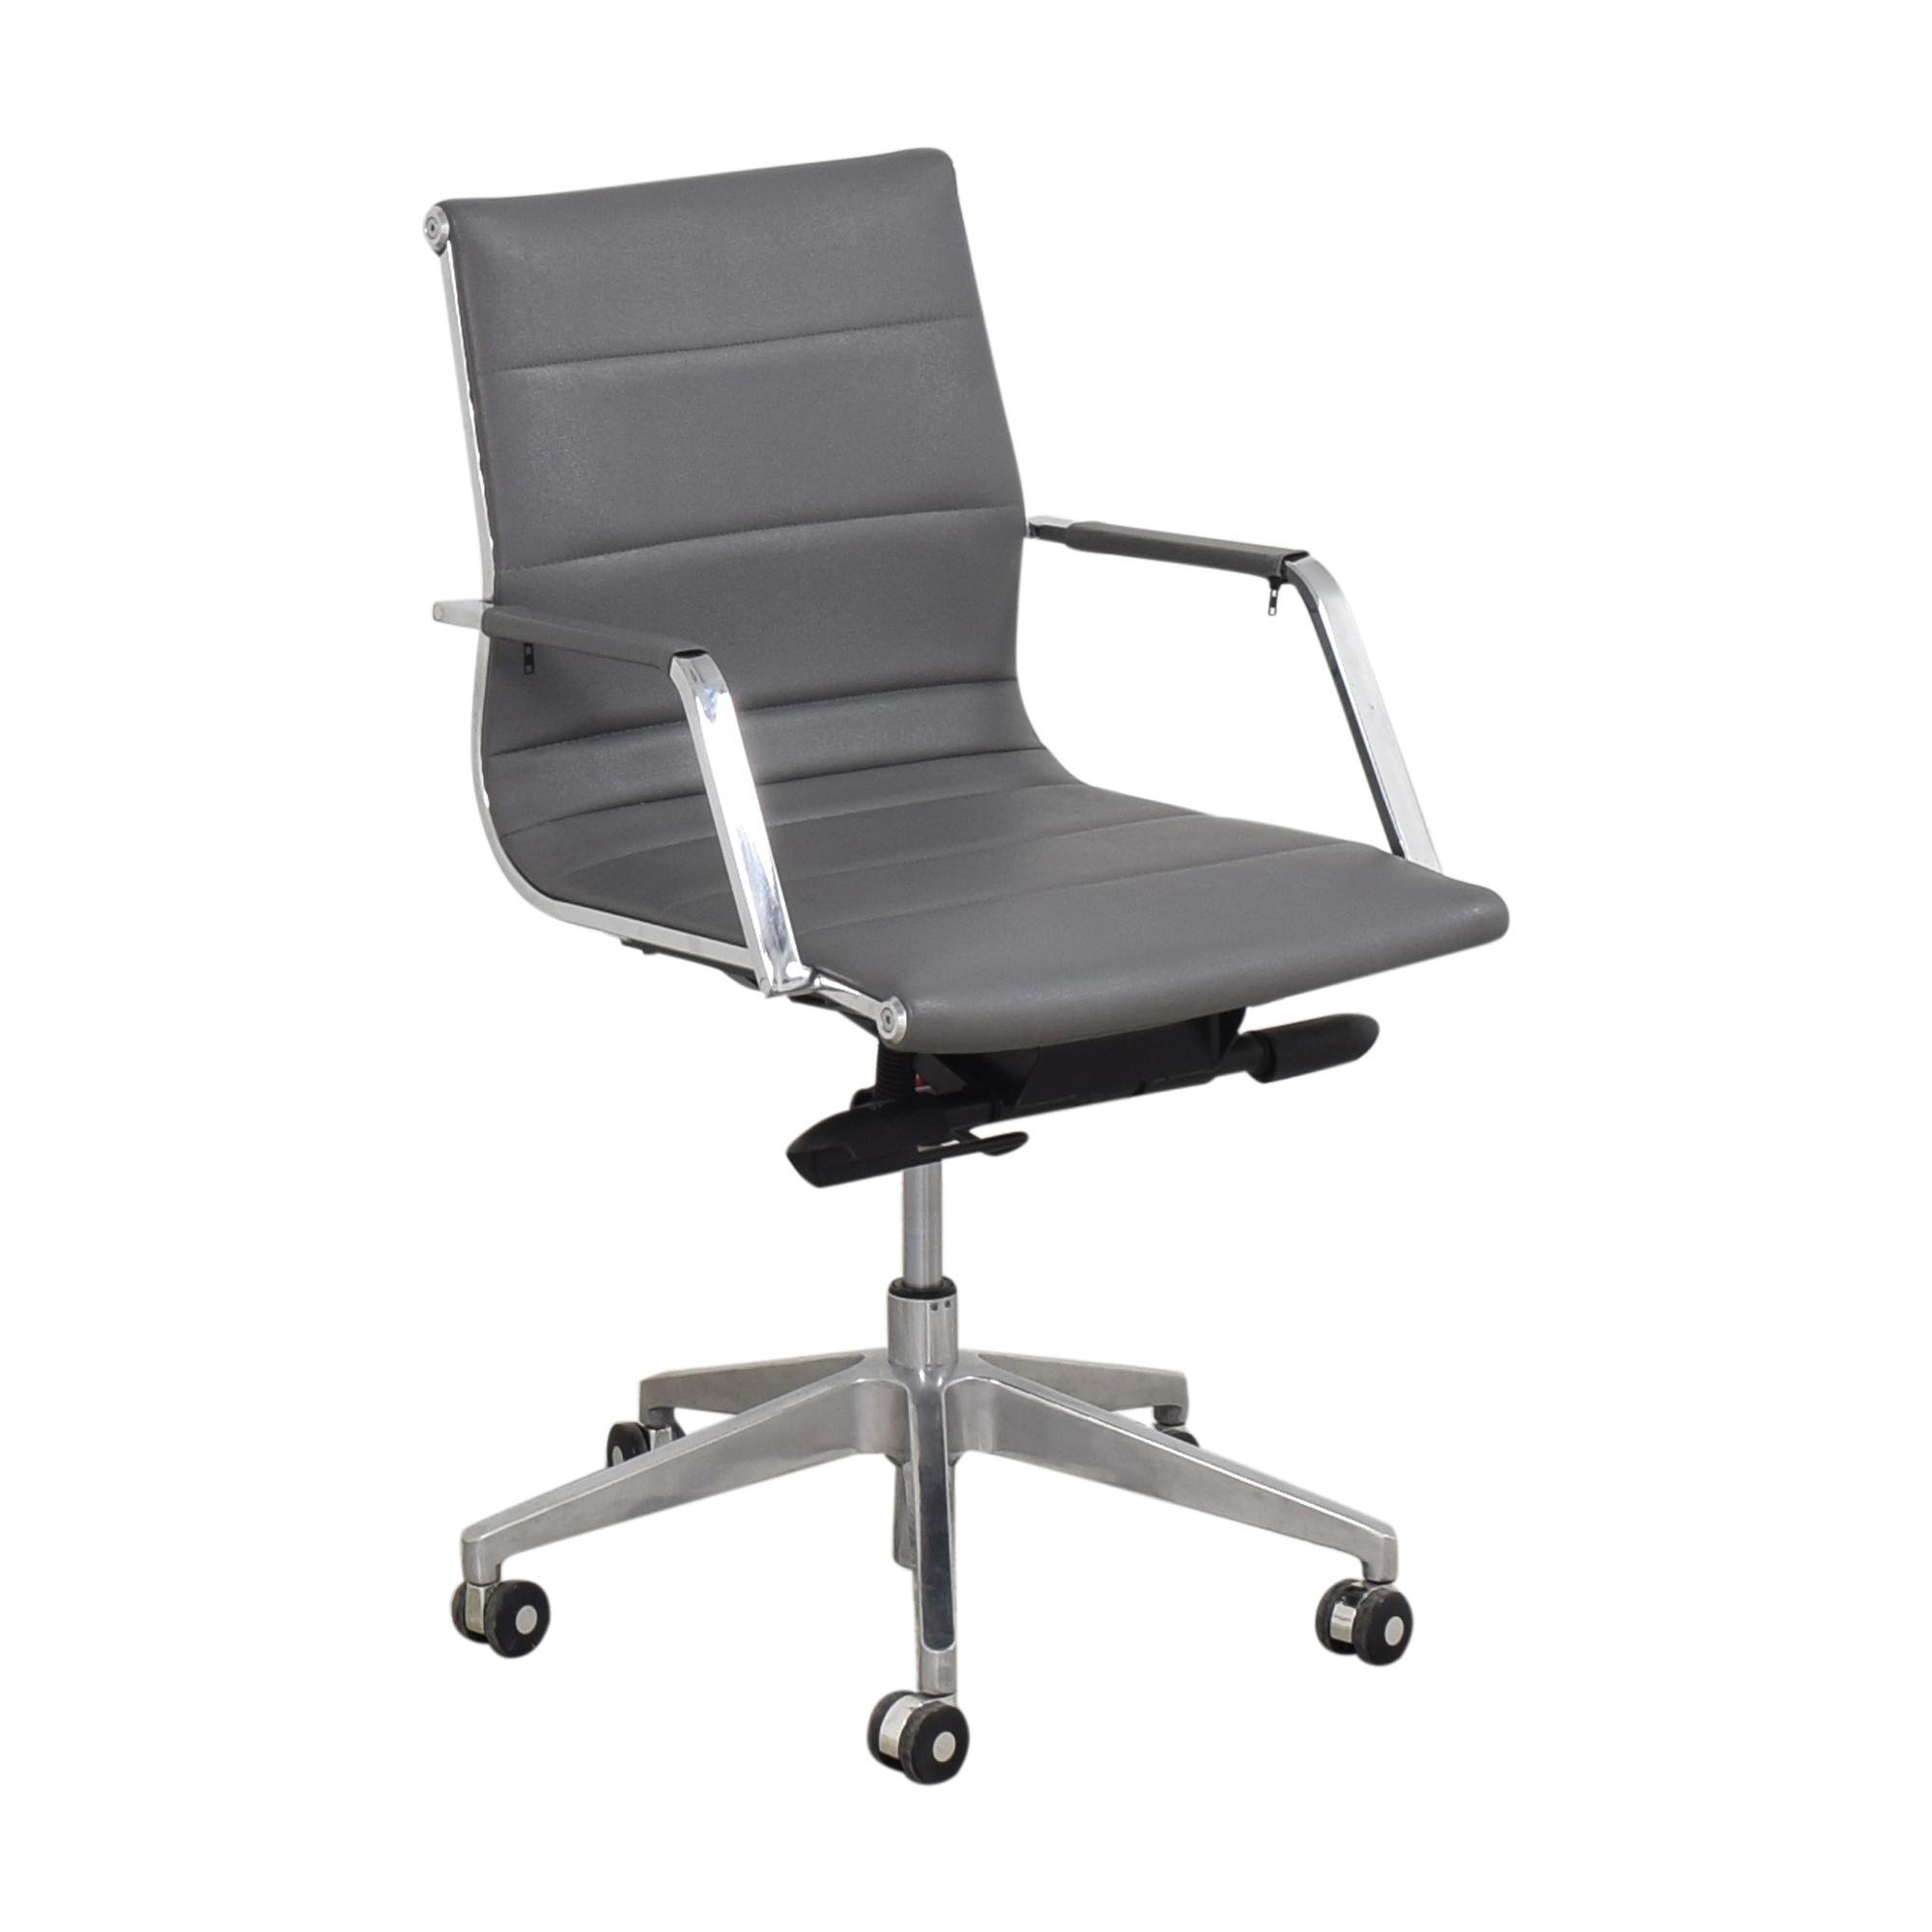 Jesper Office Adjustable Desk Chair Jesper Office